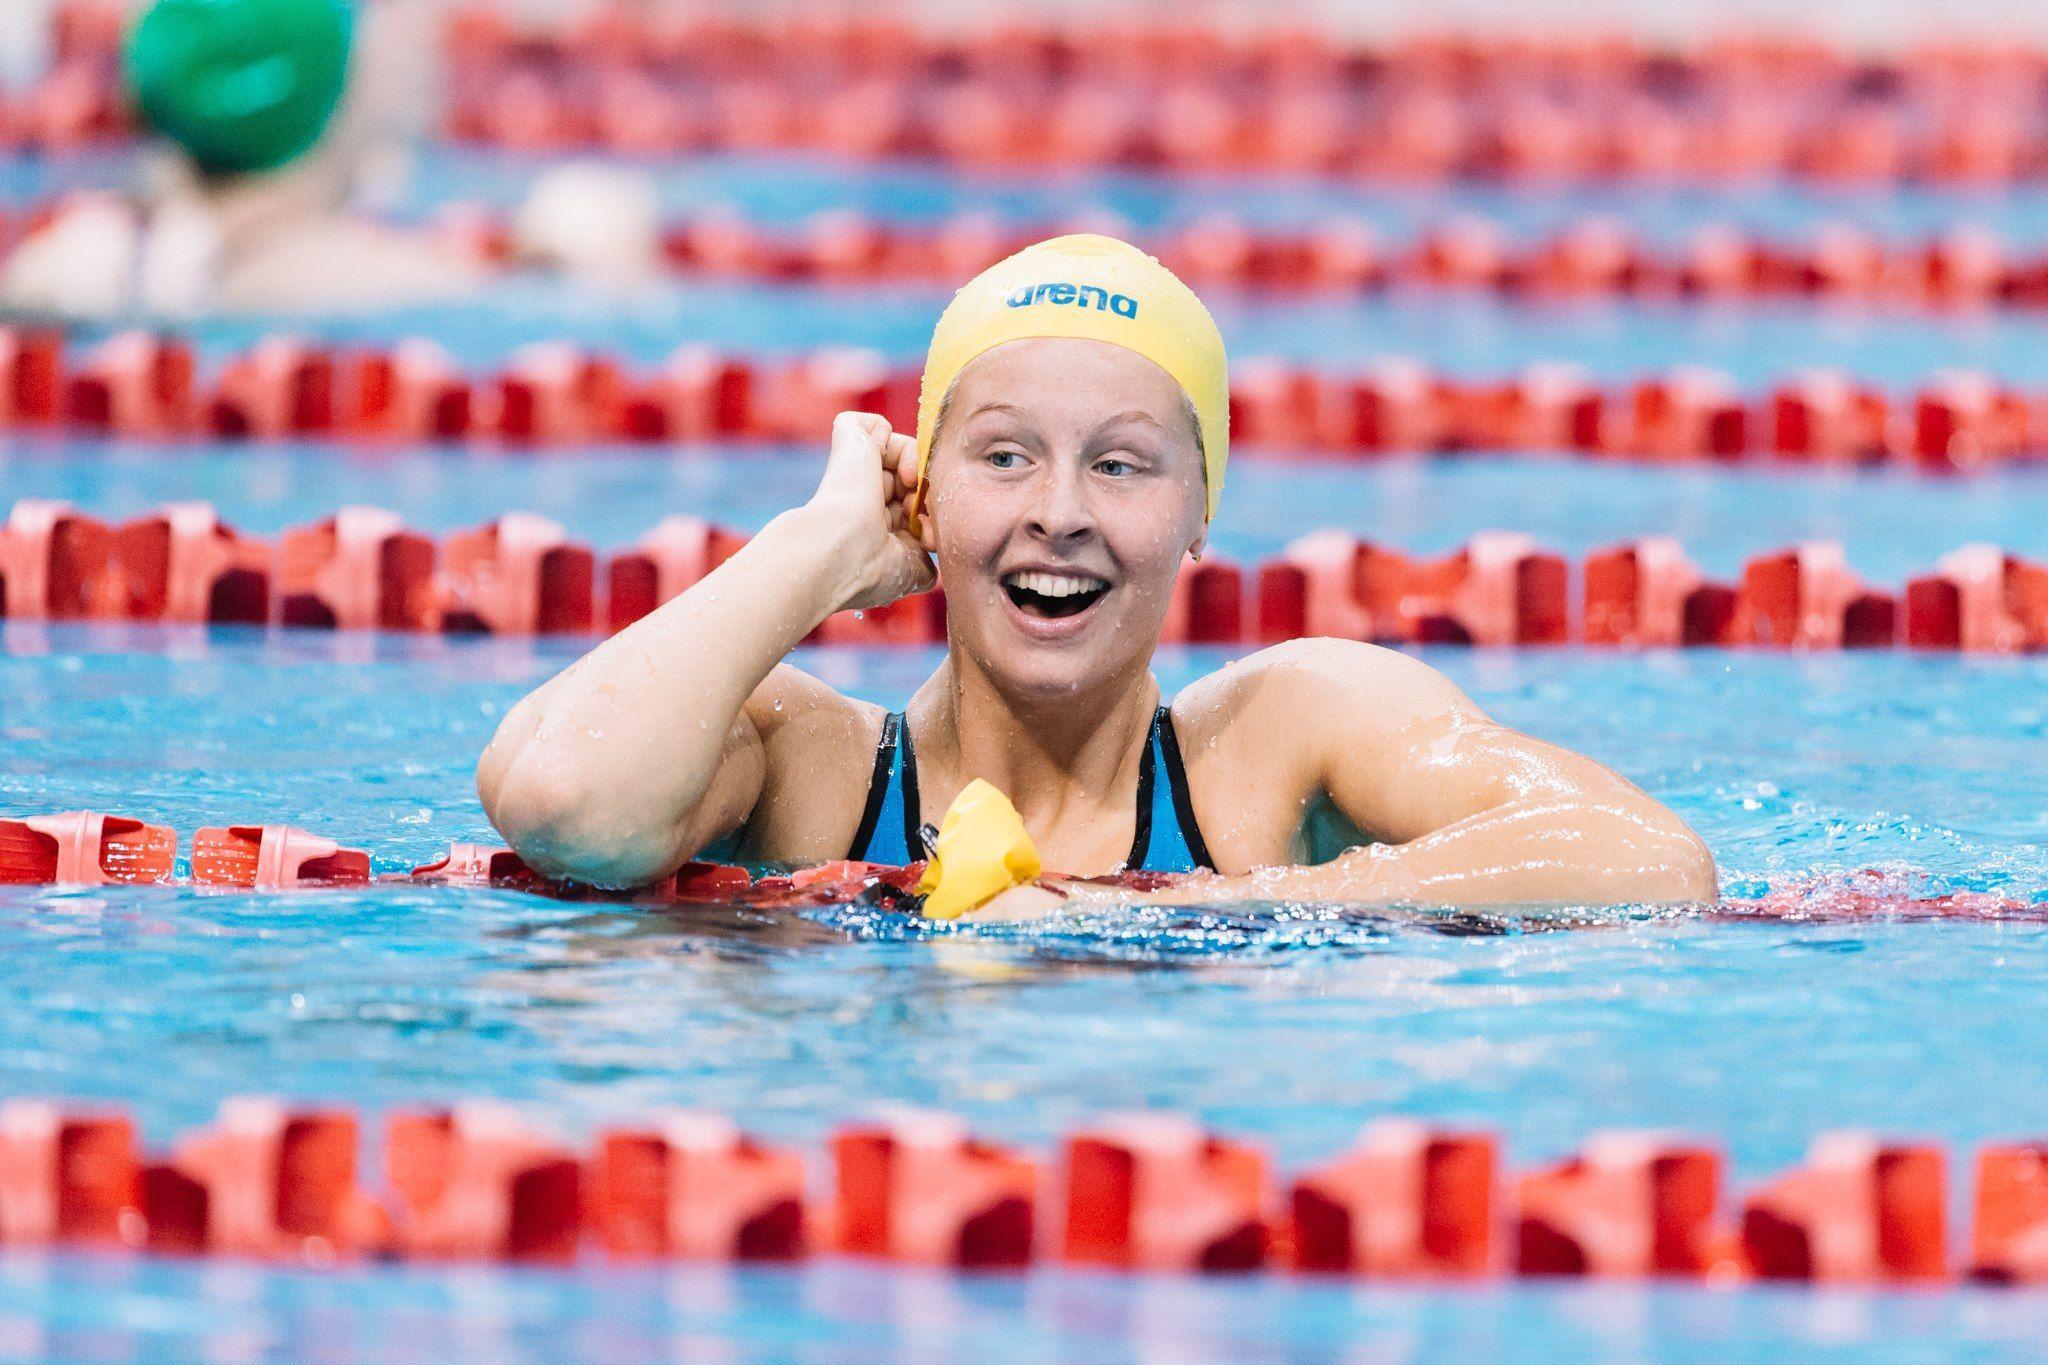 Sophie Hansson Hits 58.6 100 Breast at IU Invite Day 2 Prelims